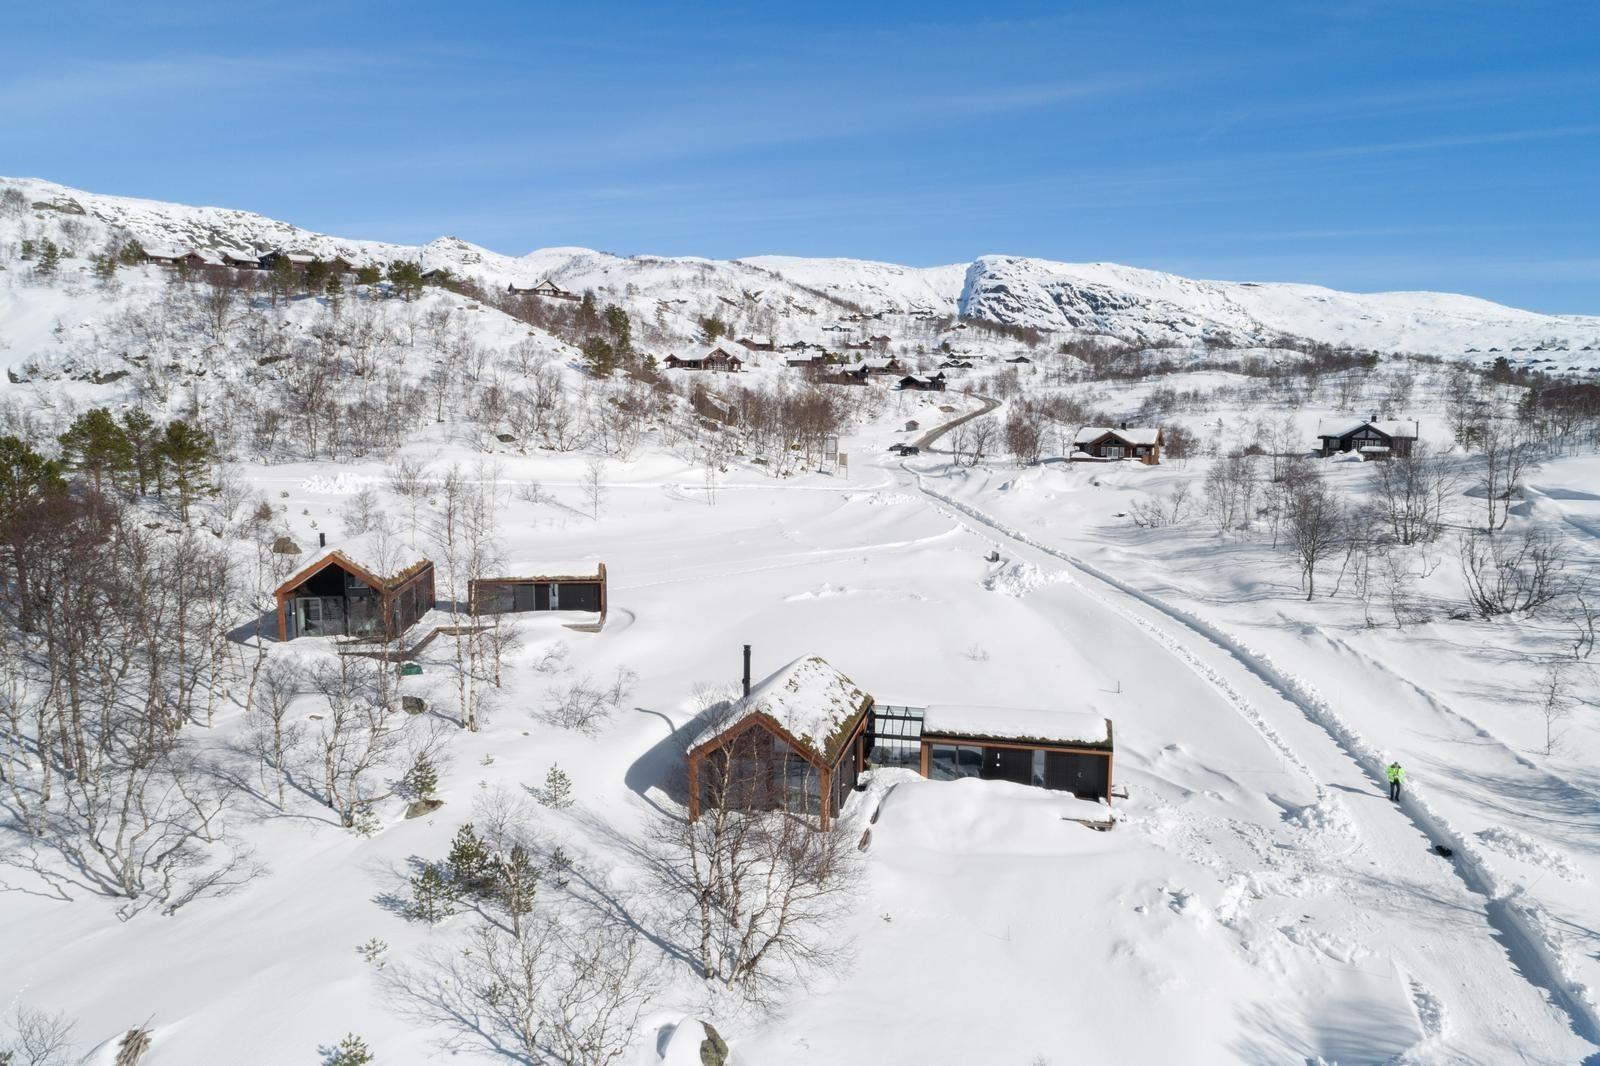 Helt unike moderne arkitekt tegnede kompakte & smarte hytter. De moderne hyttene bygges kun på Hattevarden (ingen andre steder i verden!)